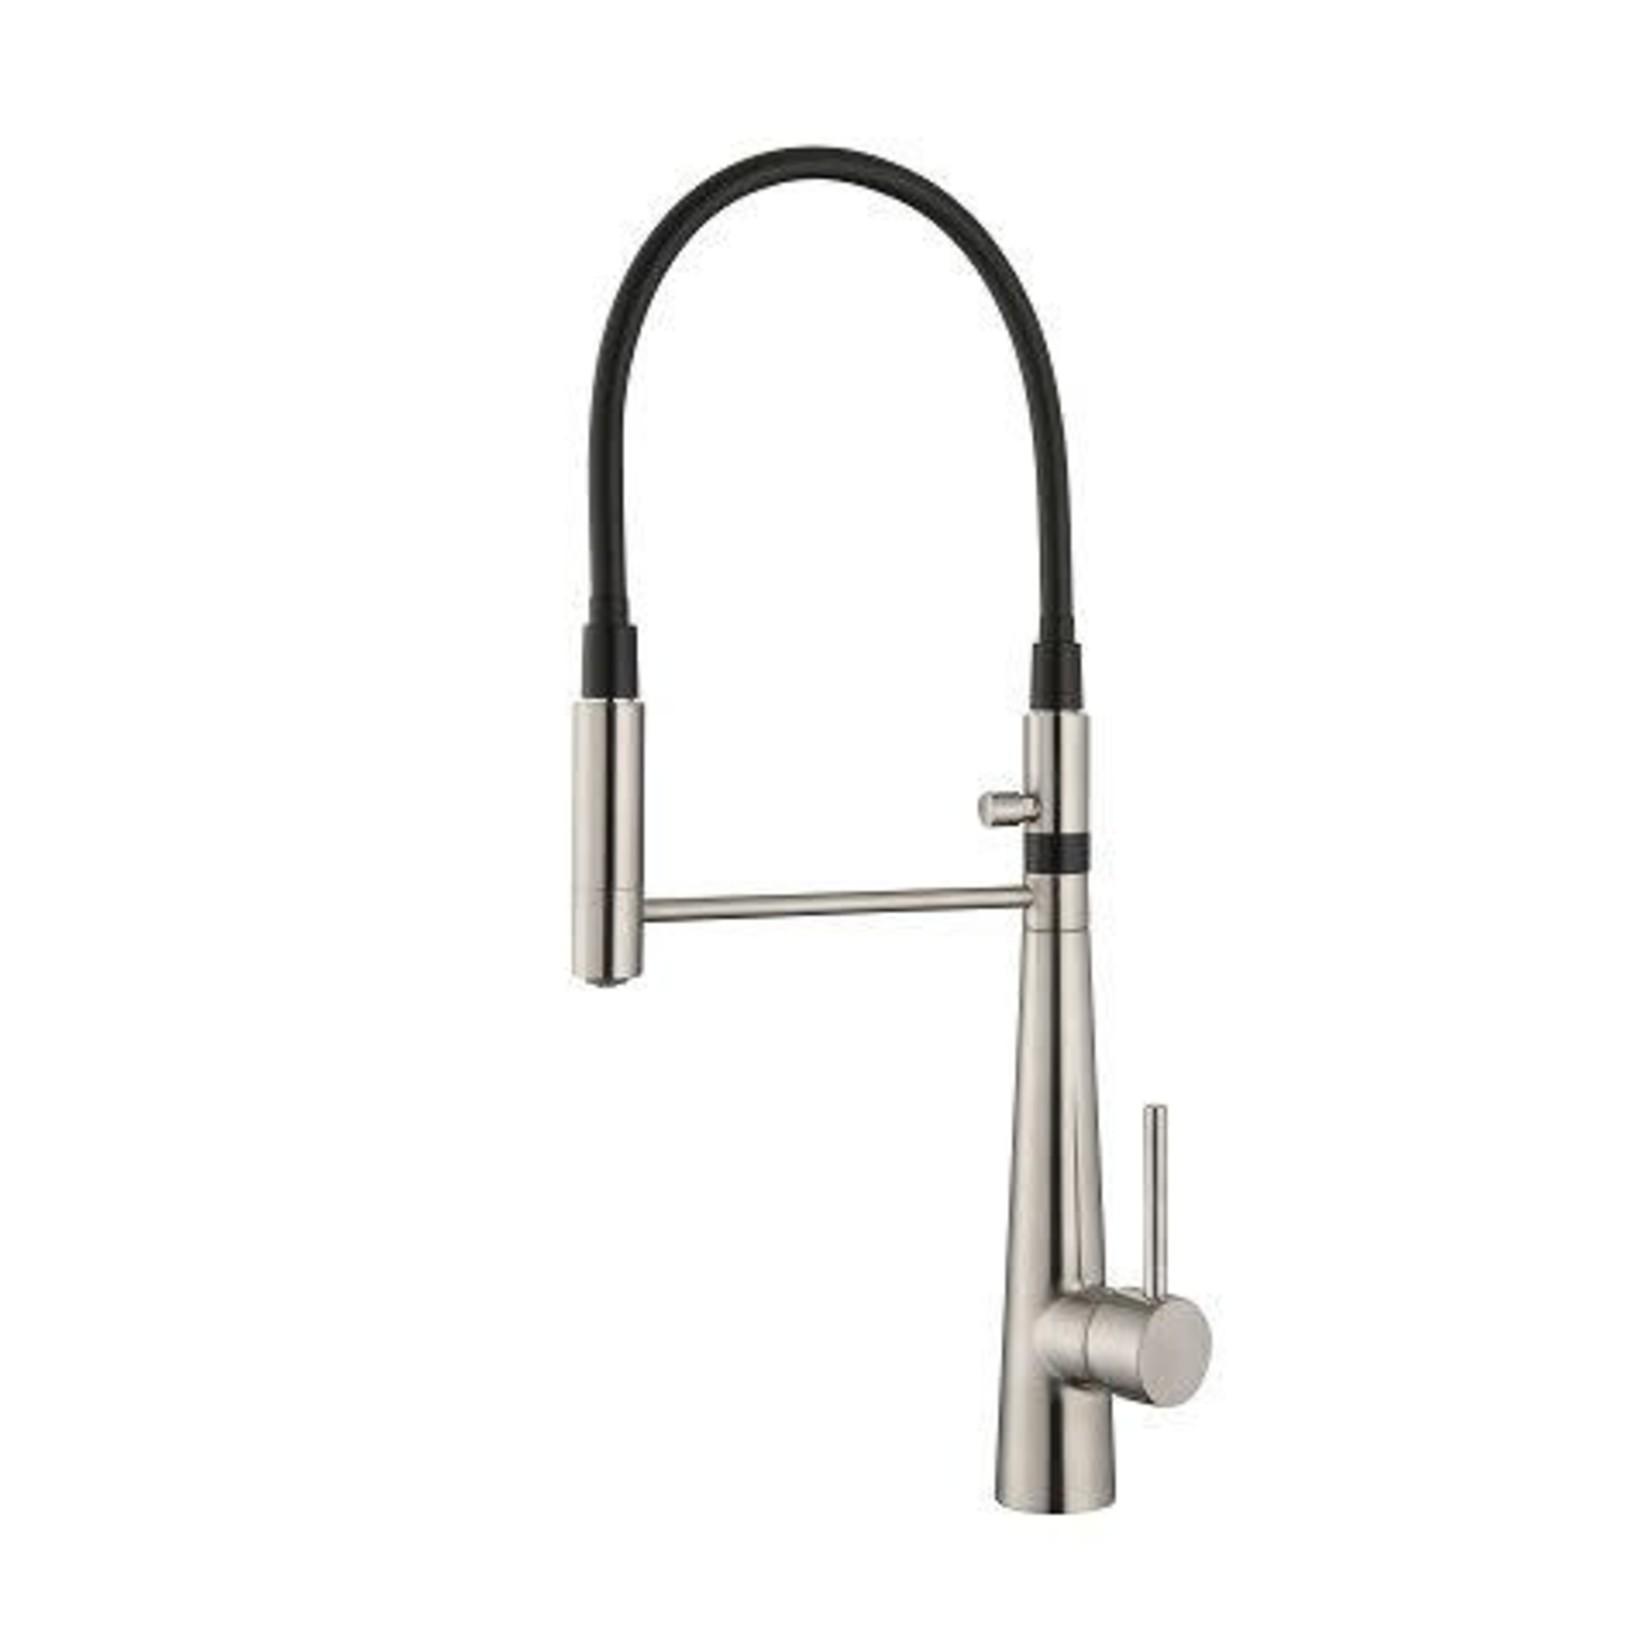 Kitchen faucet black / nickel 15598BQT-BN